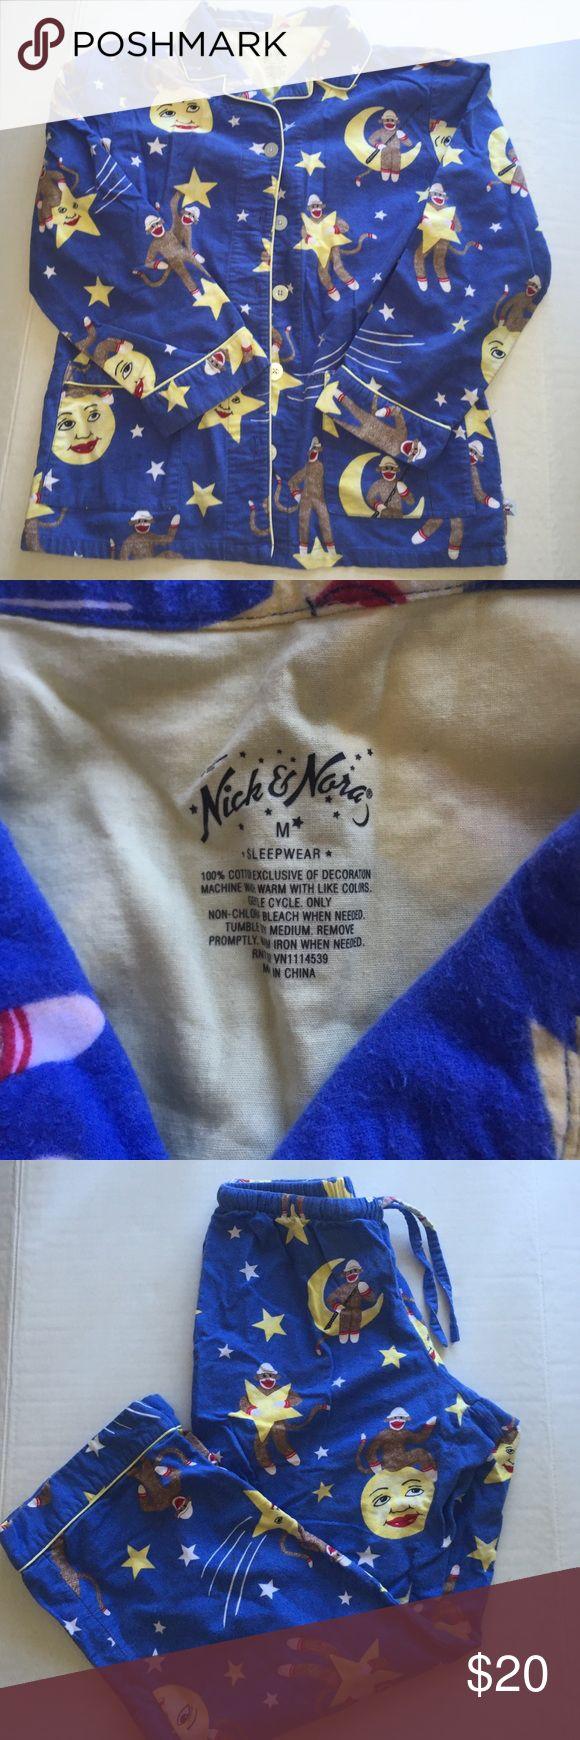 Nick & Nora moon and monkey PJ SET - M Nick & Nora sock monkey and moon and stars PJ Set - Pre owned but no stains or flaws. Nick & Nora Intimates & Sleepwear Pajamas